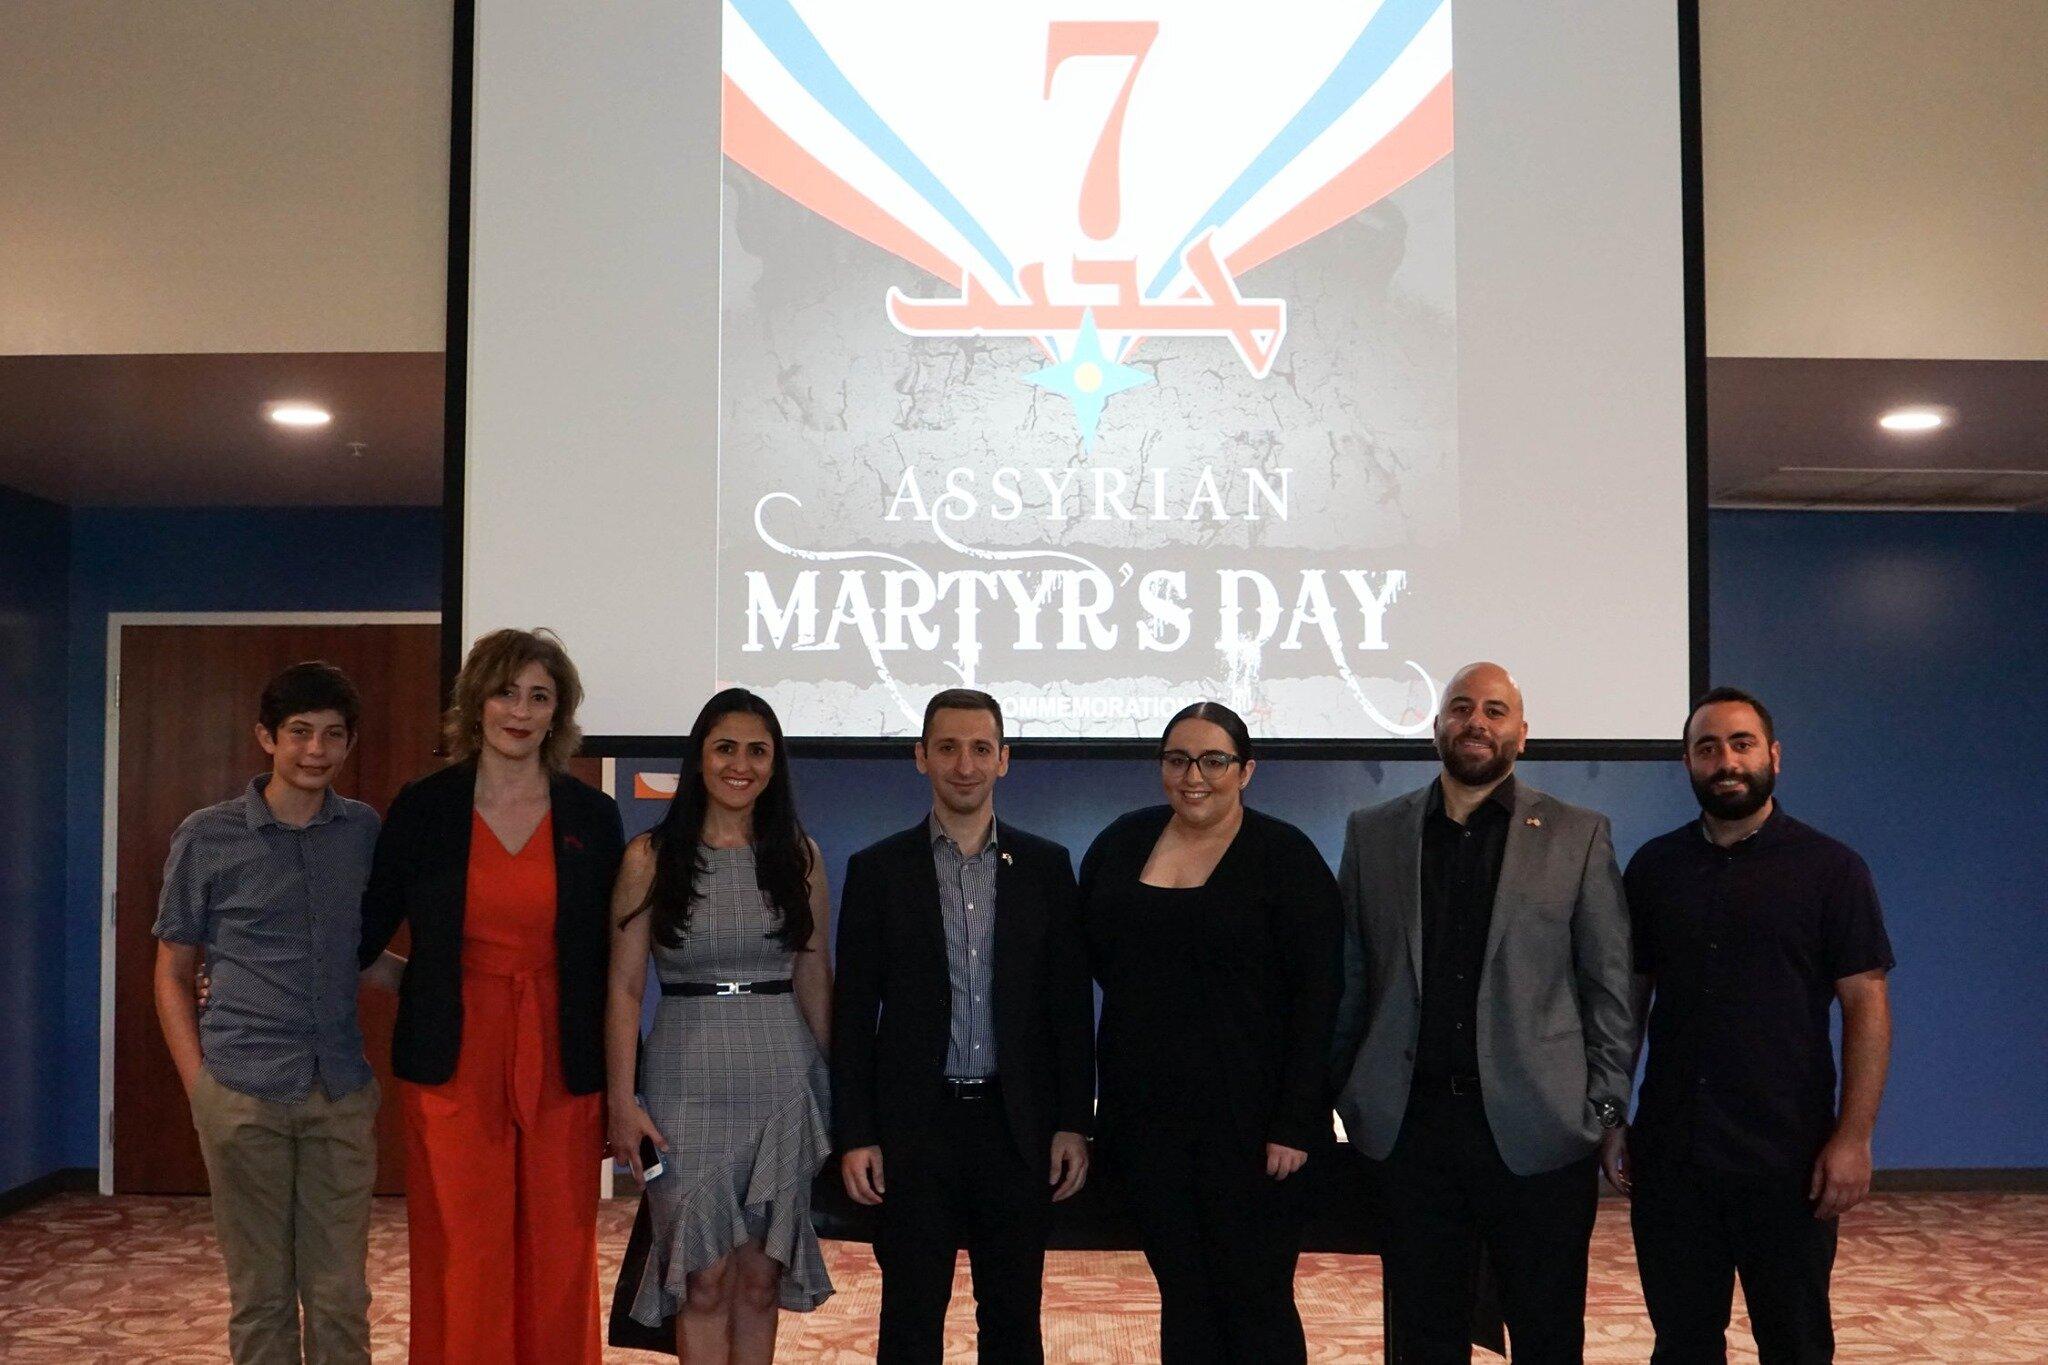 Assyrian Martyr's Day 2019